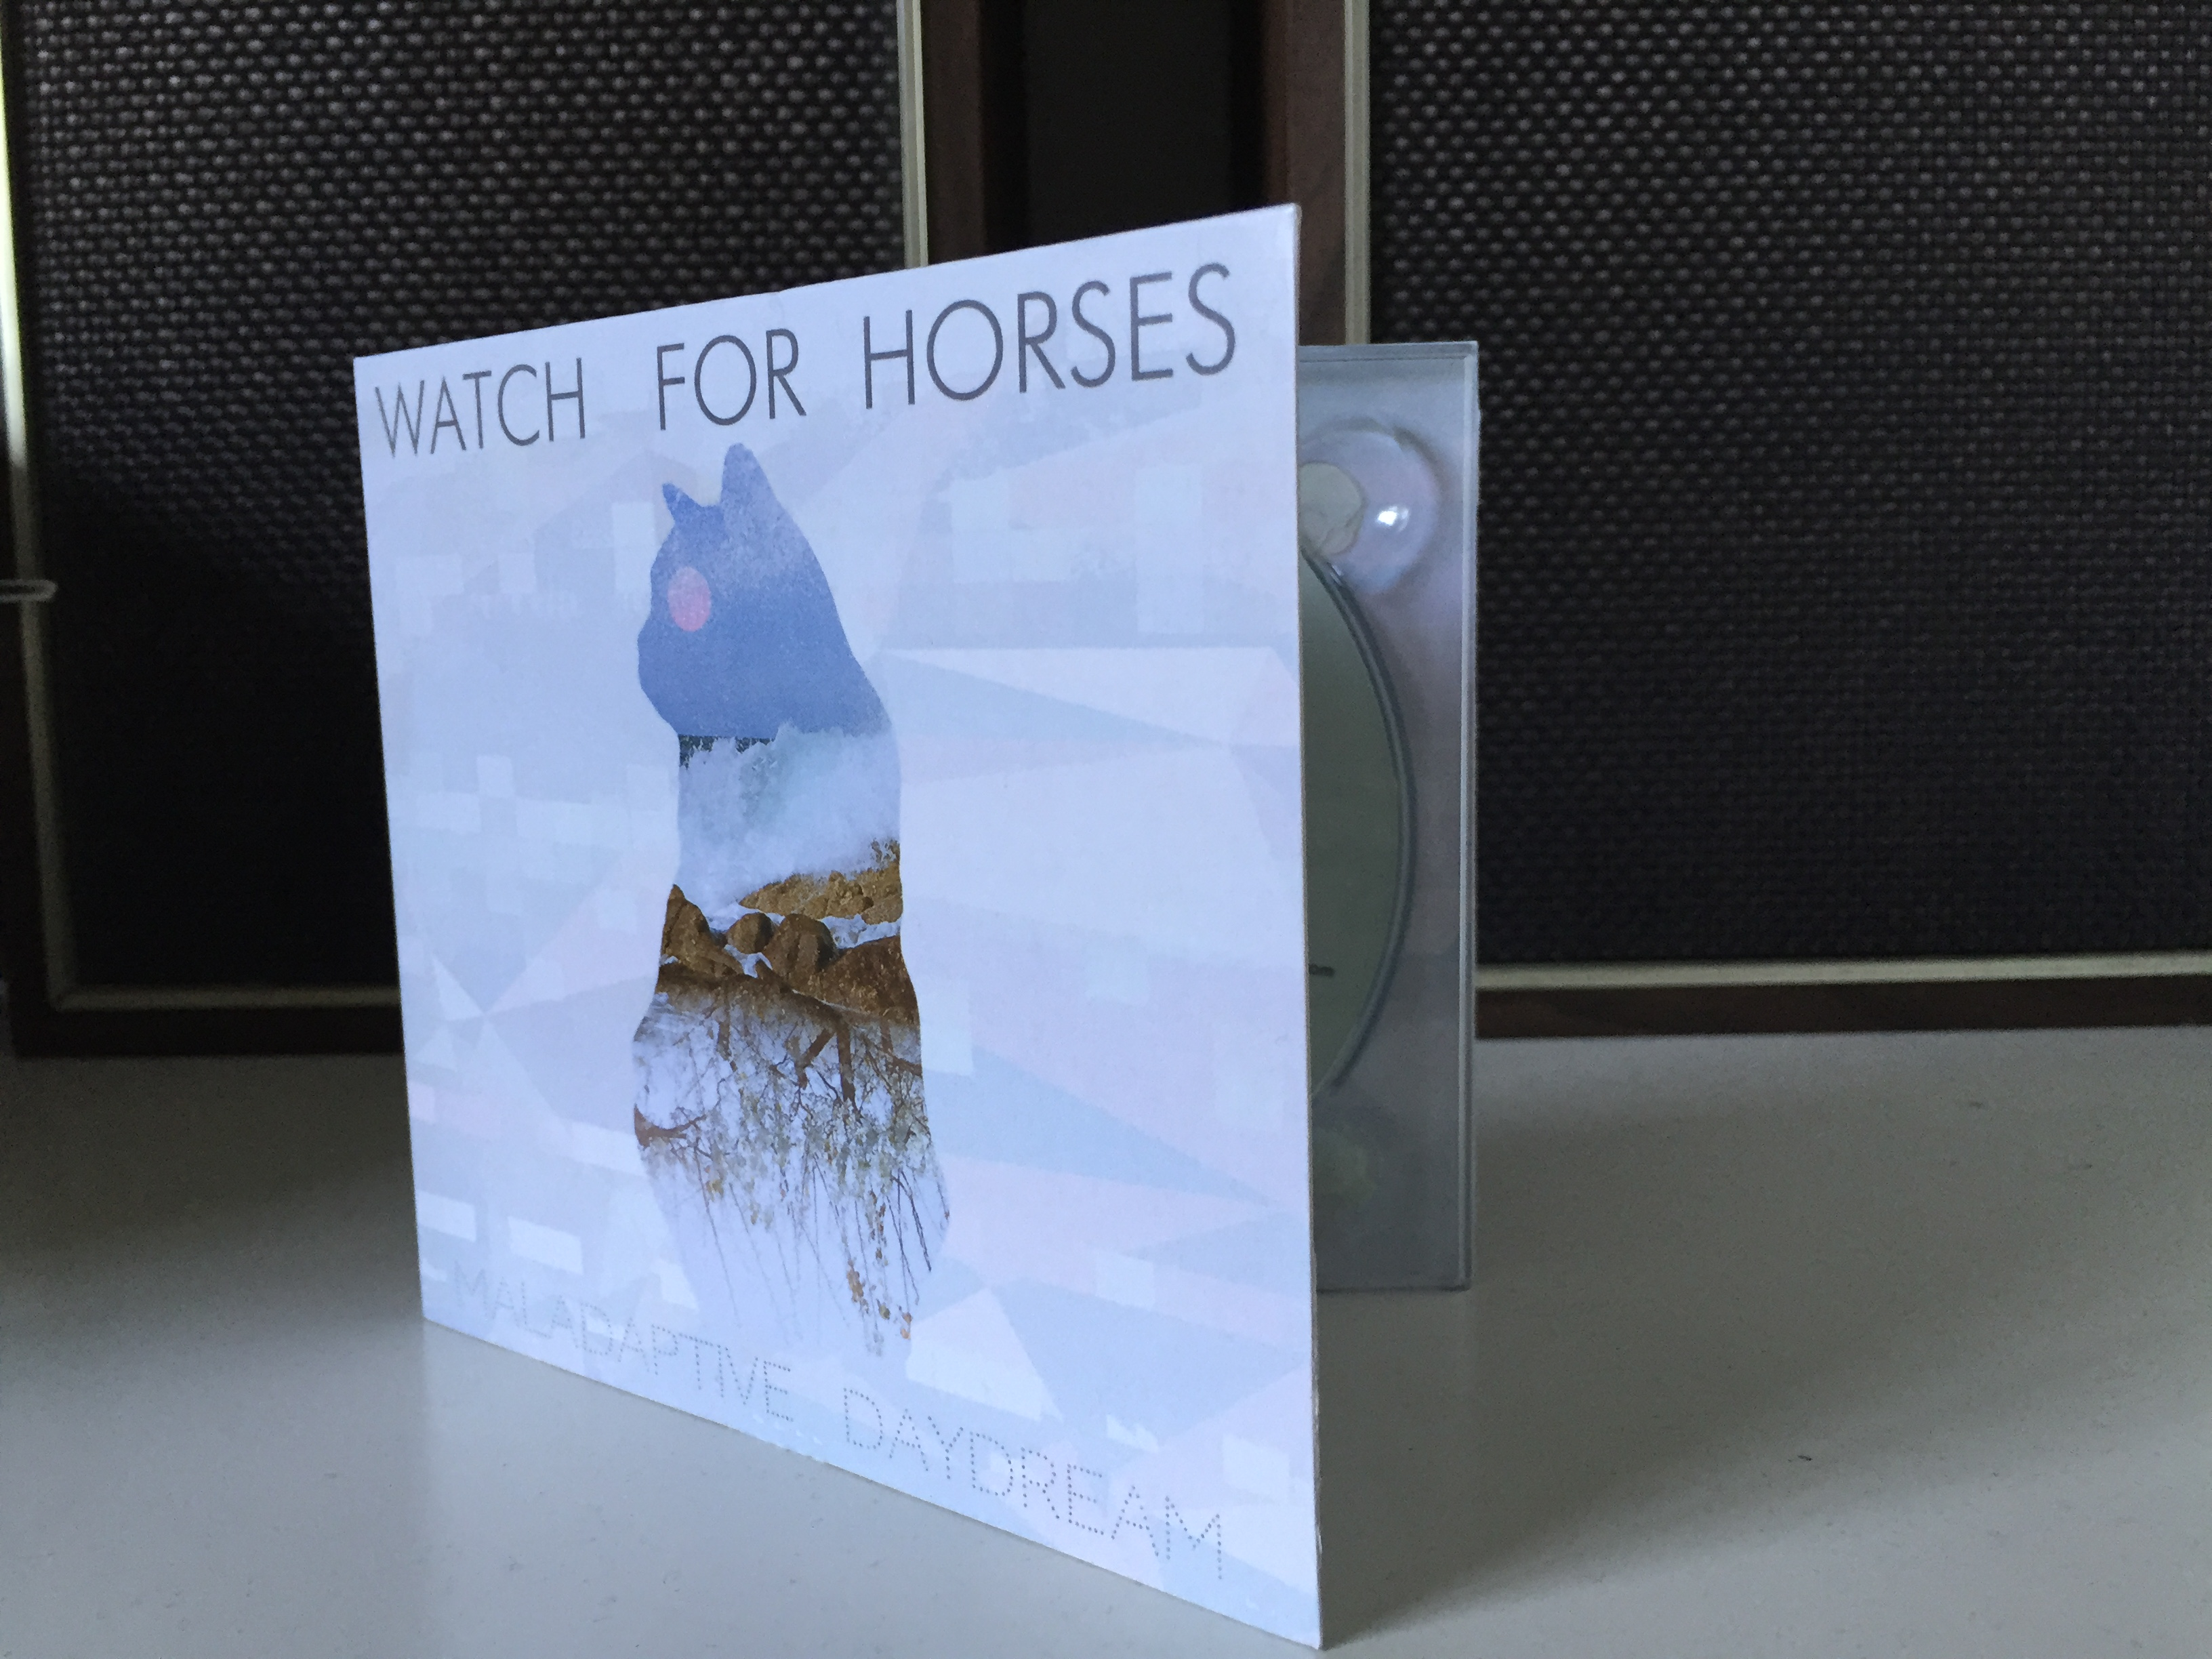 Wiretap Records Watch For Horses Maladaptive Daydream Cd